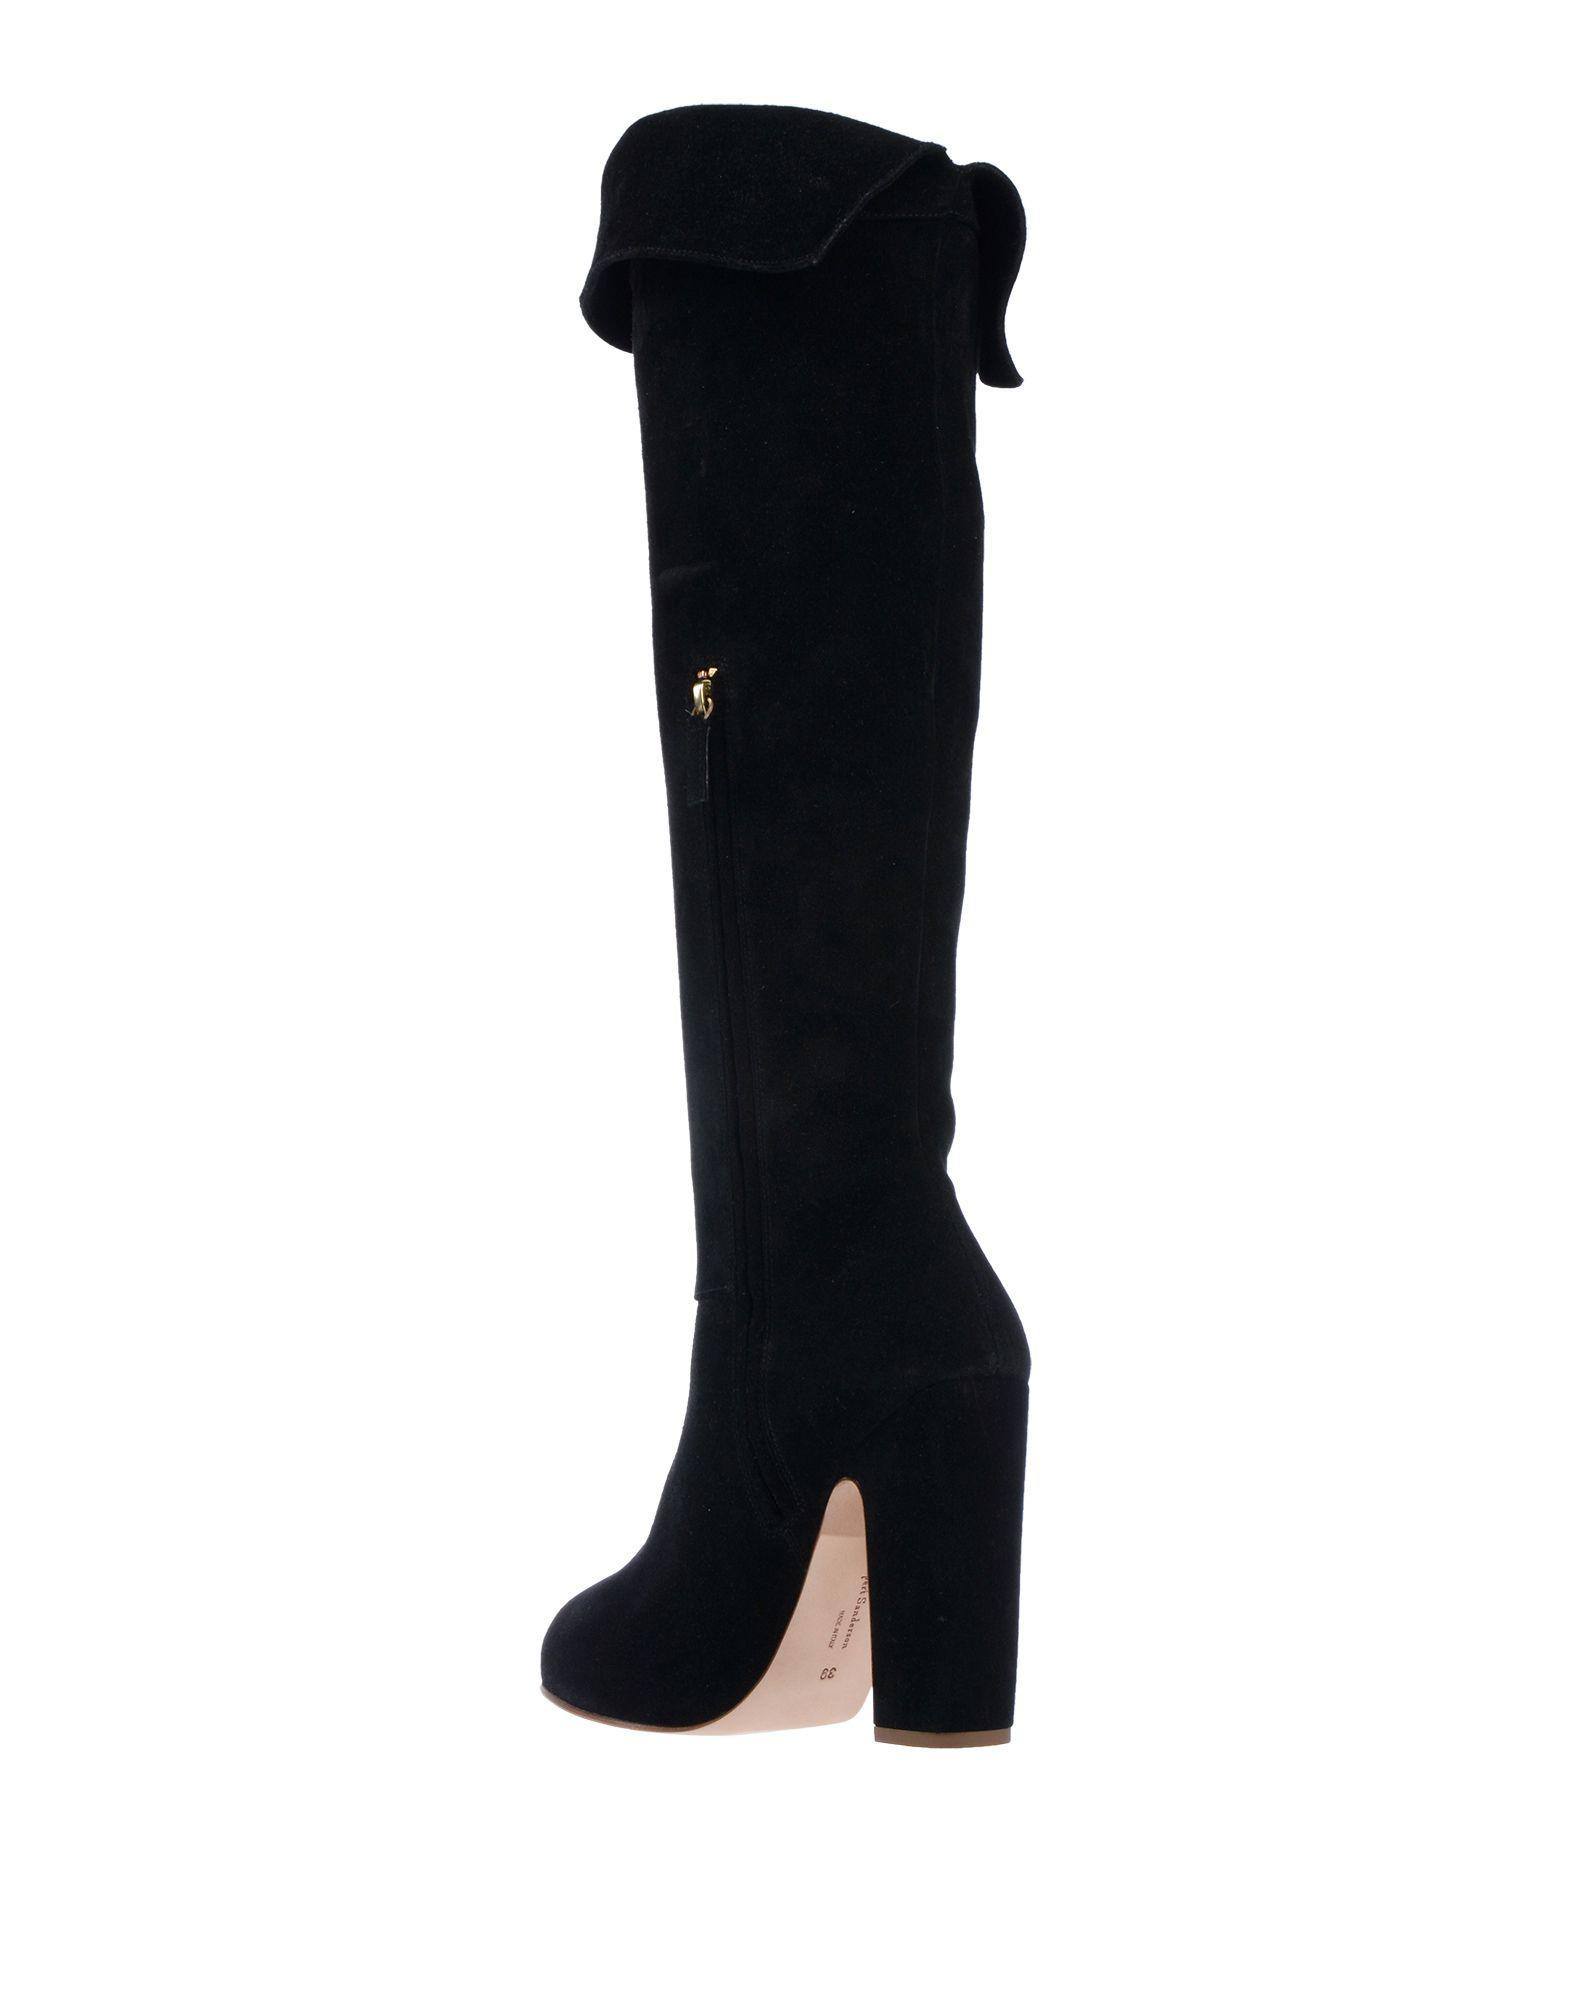 82c9626bb3c Lyst - Rupert Sanderson Boots in Black